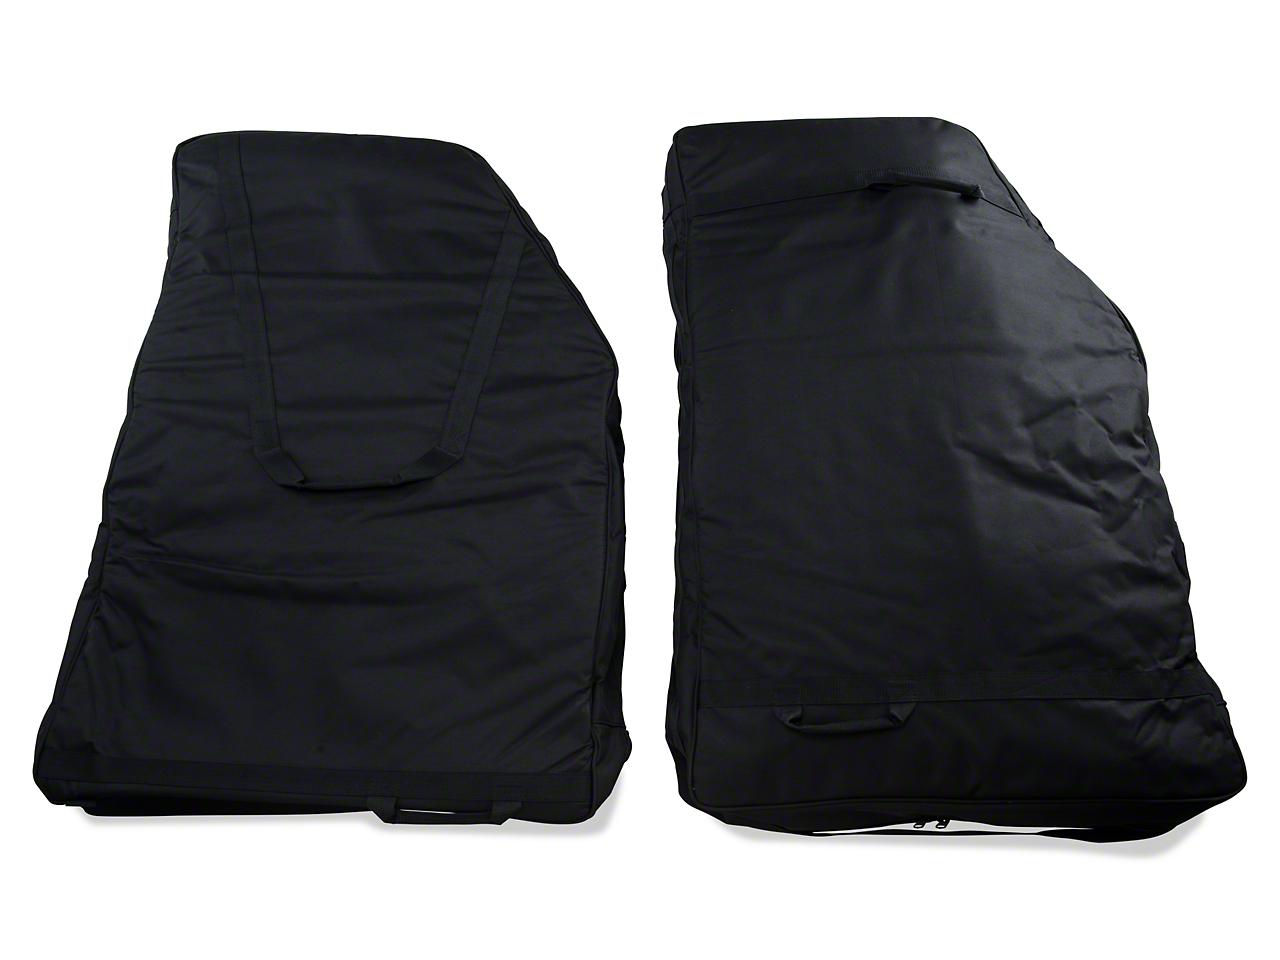 Rugged Ridge Rear Door Storage Bag Kit (07-18 Wrangler JK; 2018 Wrangler JL)